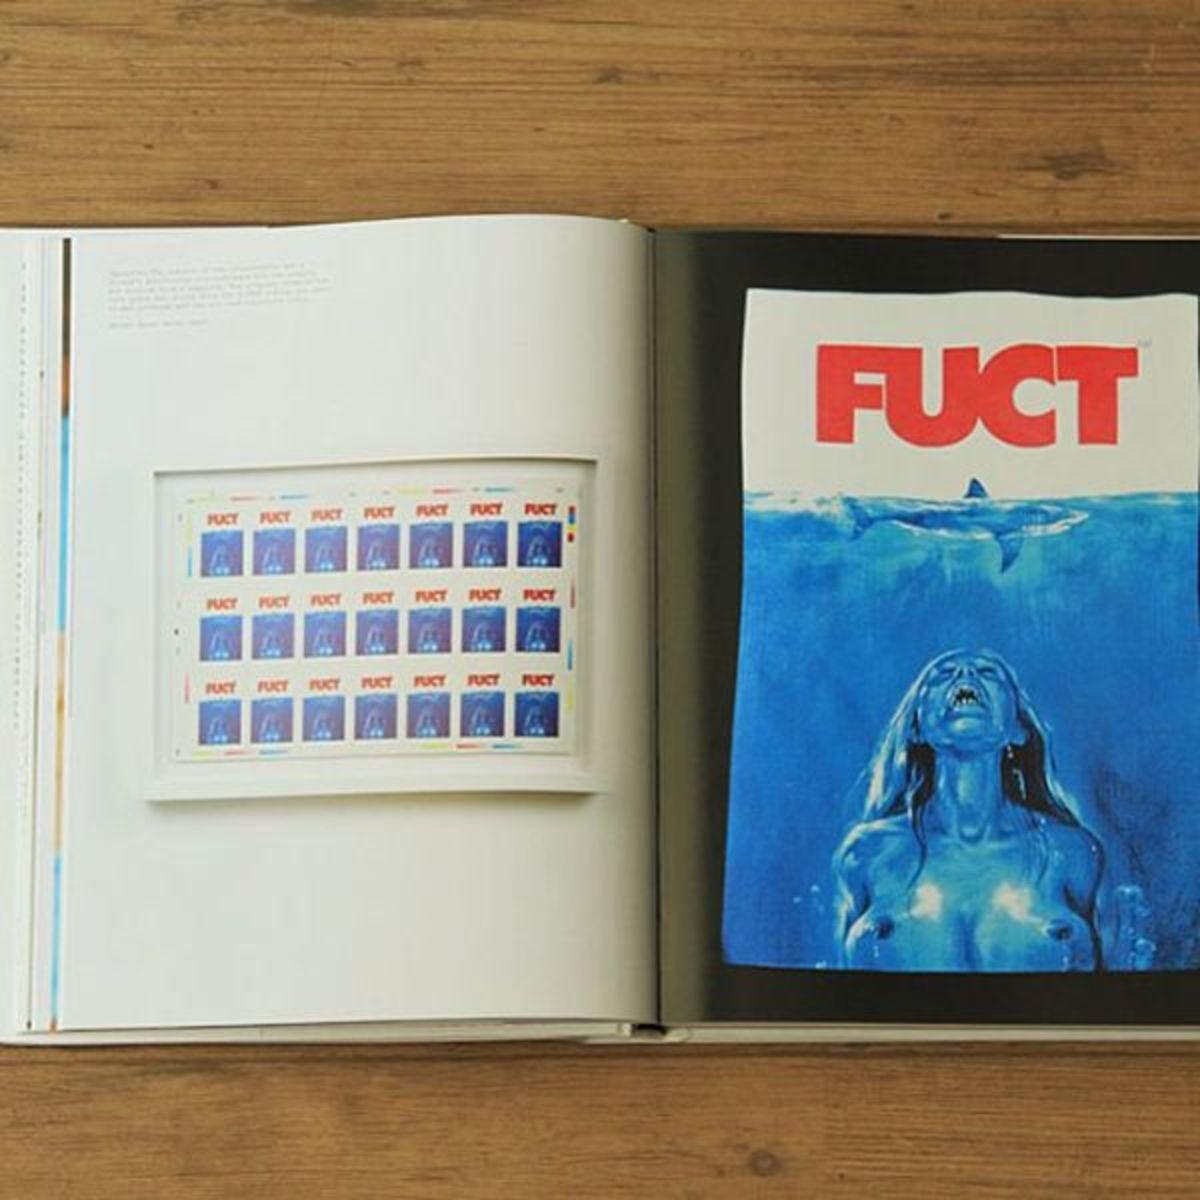 EDM Culture: Fuct Retrospective Book By Erik Brunetti